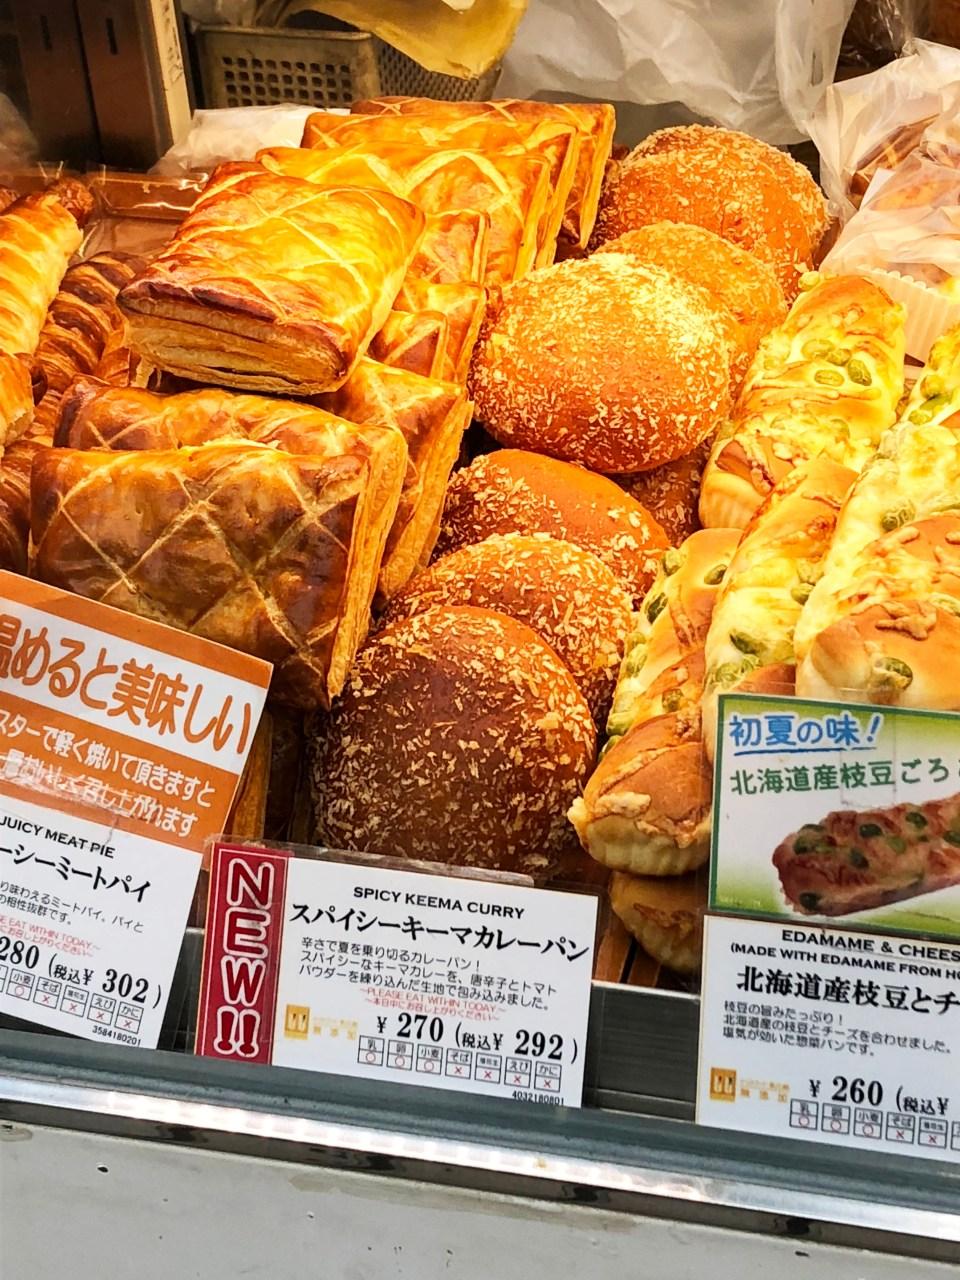 Shinjuku Station - food